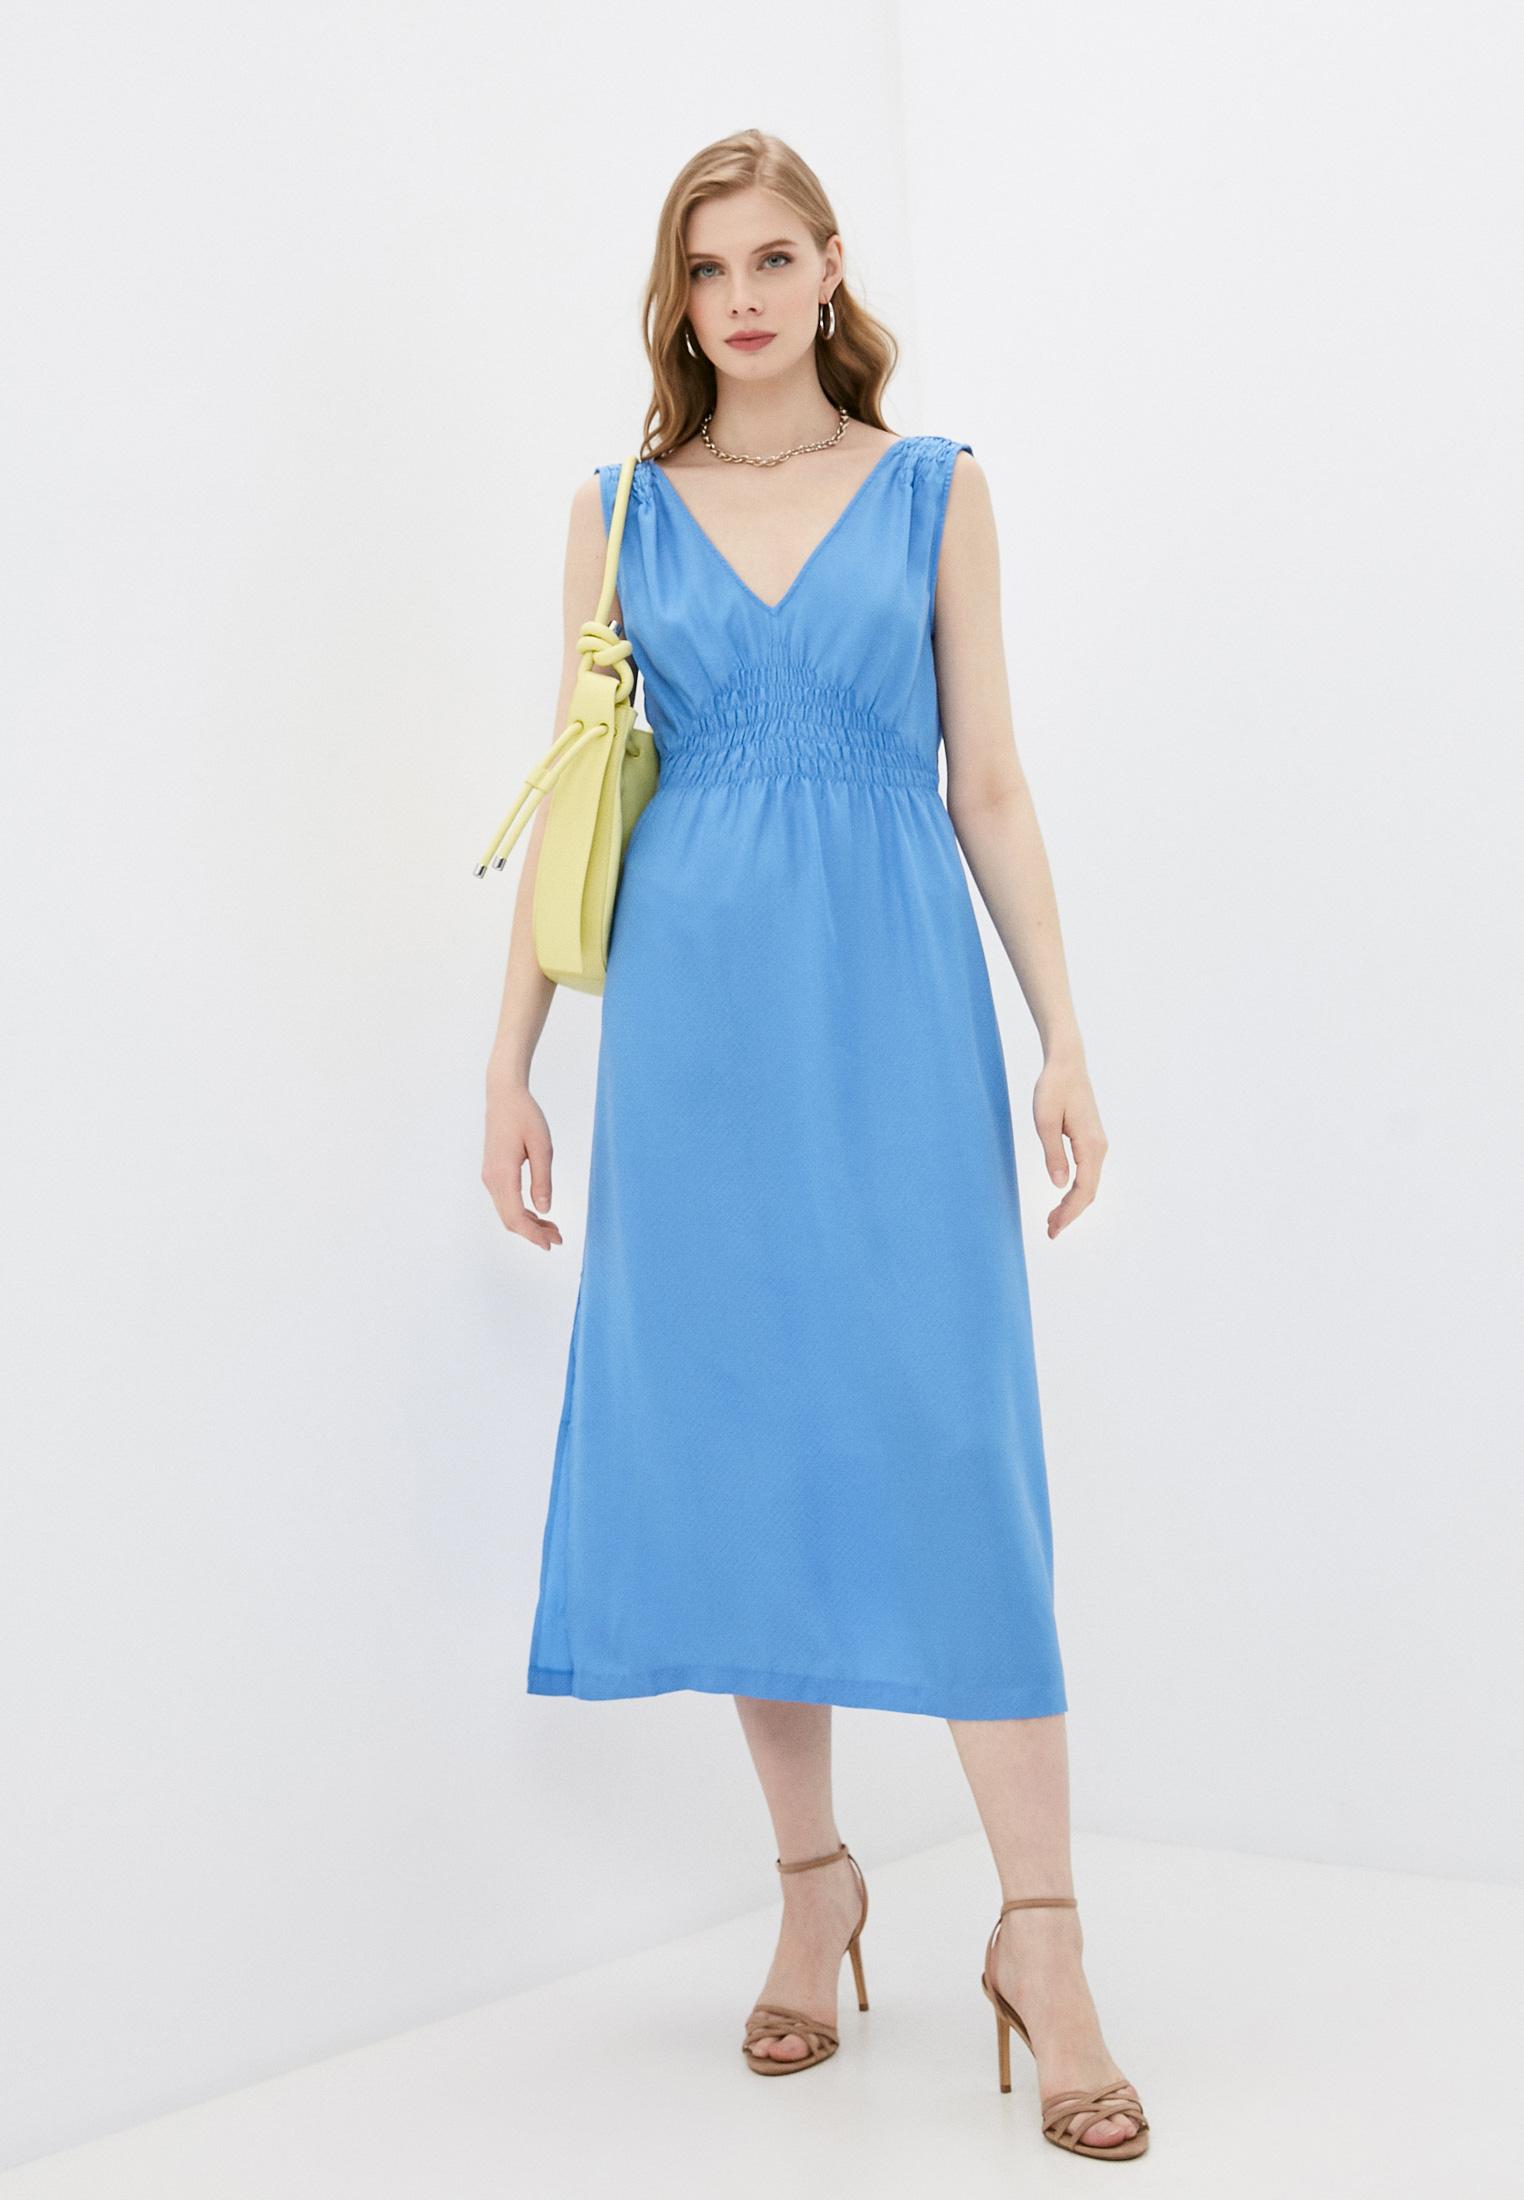 Платье Pepe Jeans (Пепе Джинс) PL952841